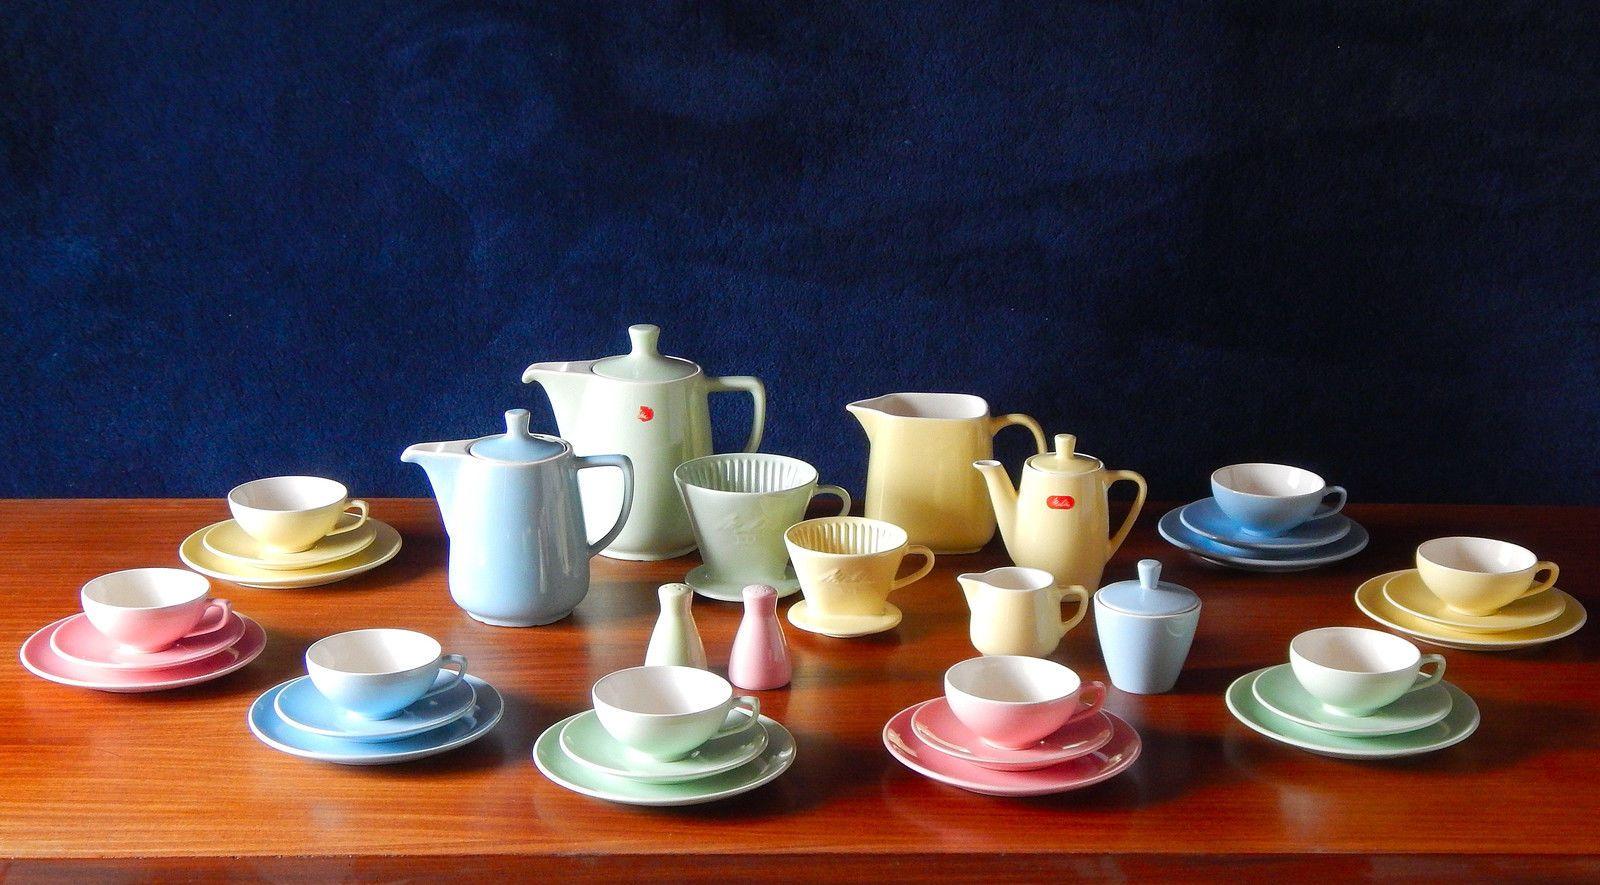 melitta minden melitta pinterest keramik pastell und porzellan. Black Bedroom Furniture Sets. Home Design Ideas